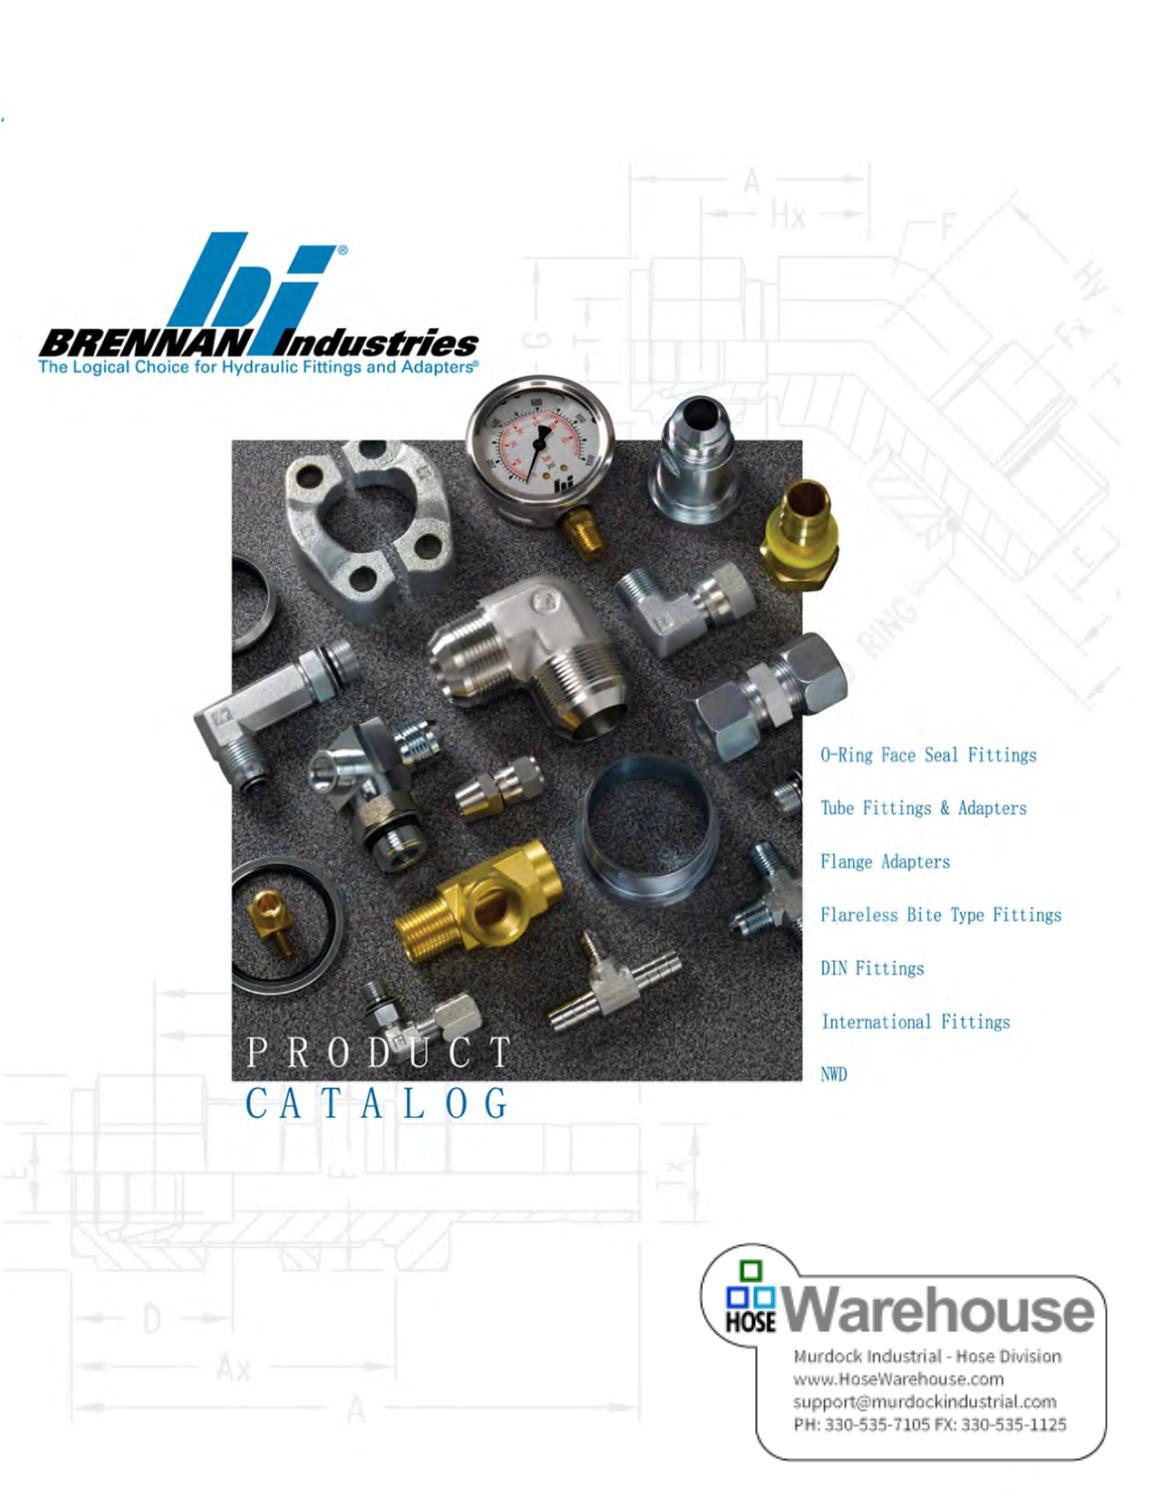 Brennan Industries 6400-05-06-O Steel Straight Tube Fitting 5//16 Male JIC x 5//16 Male O-Ring Boss 1//2-20 SAE x 9//16-18 SAE ORB Thread